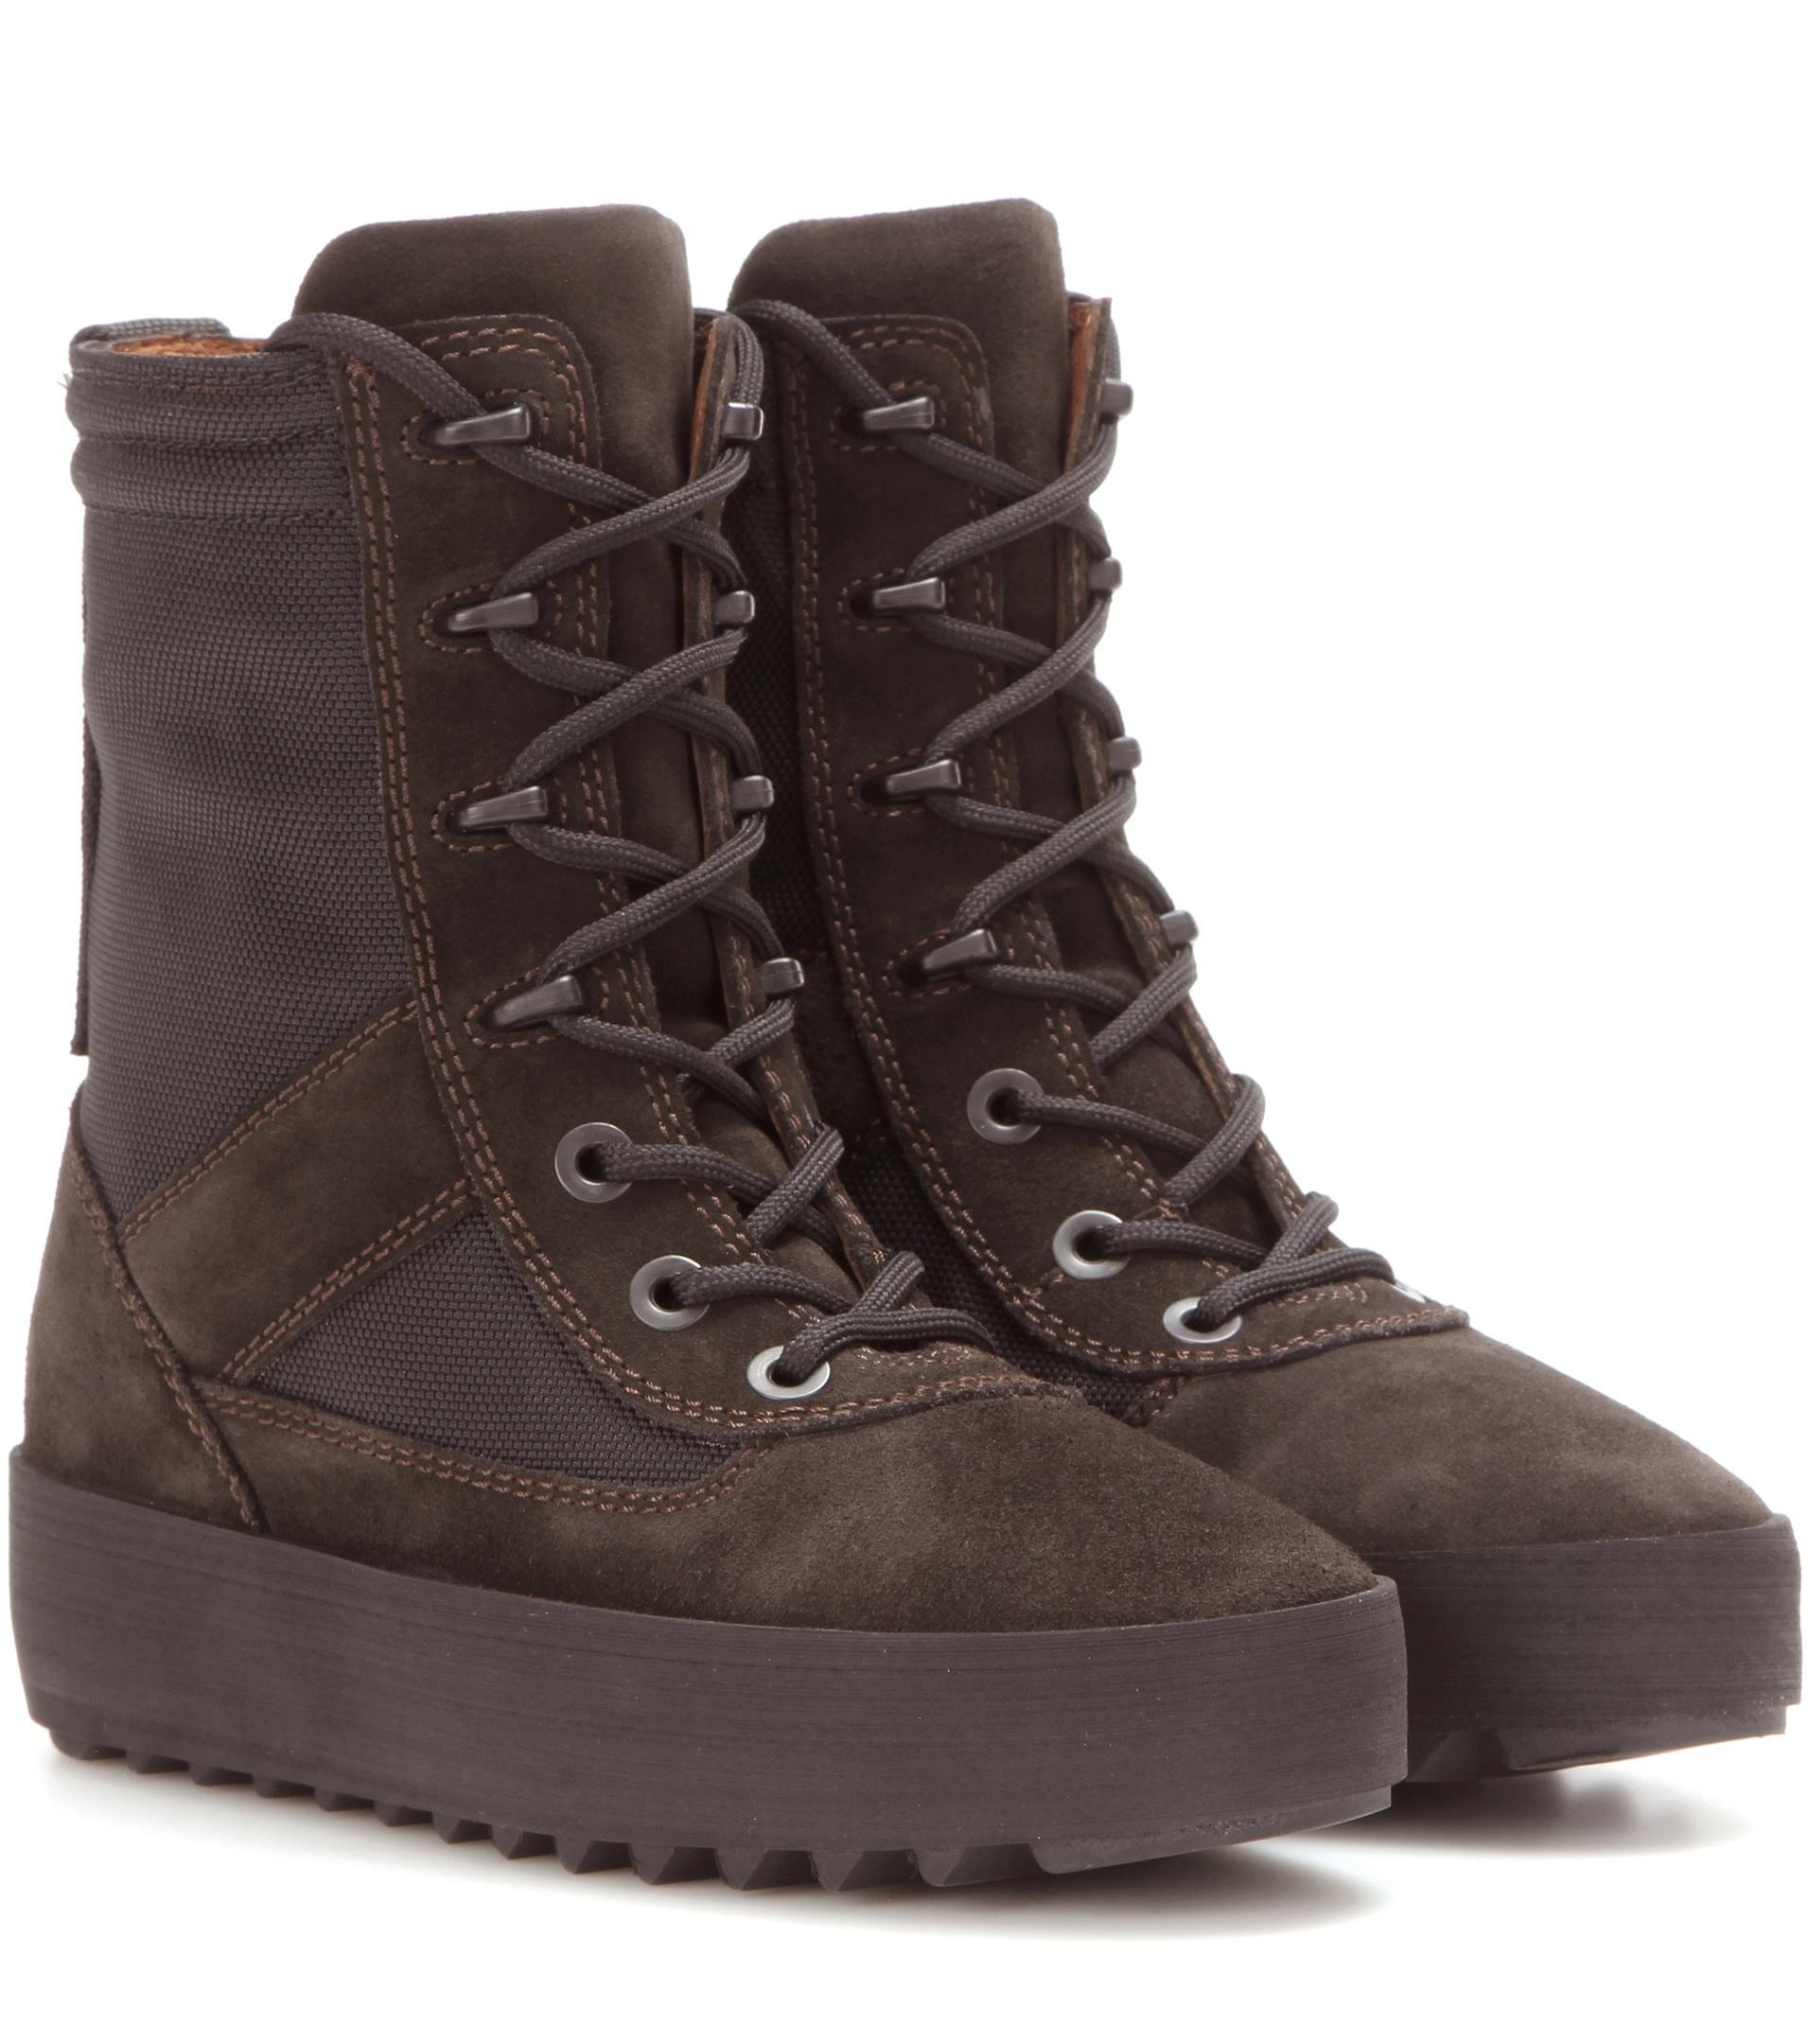 Model Yeezy / Military Boot Yeezy / Shoes Accessories Women | Storm